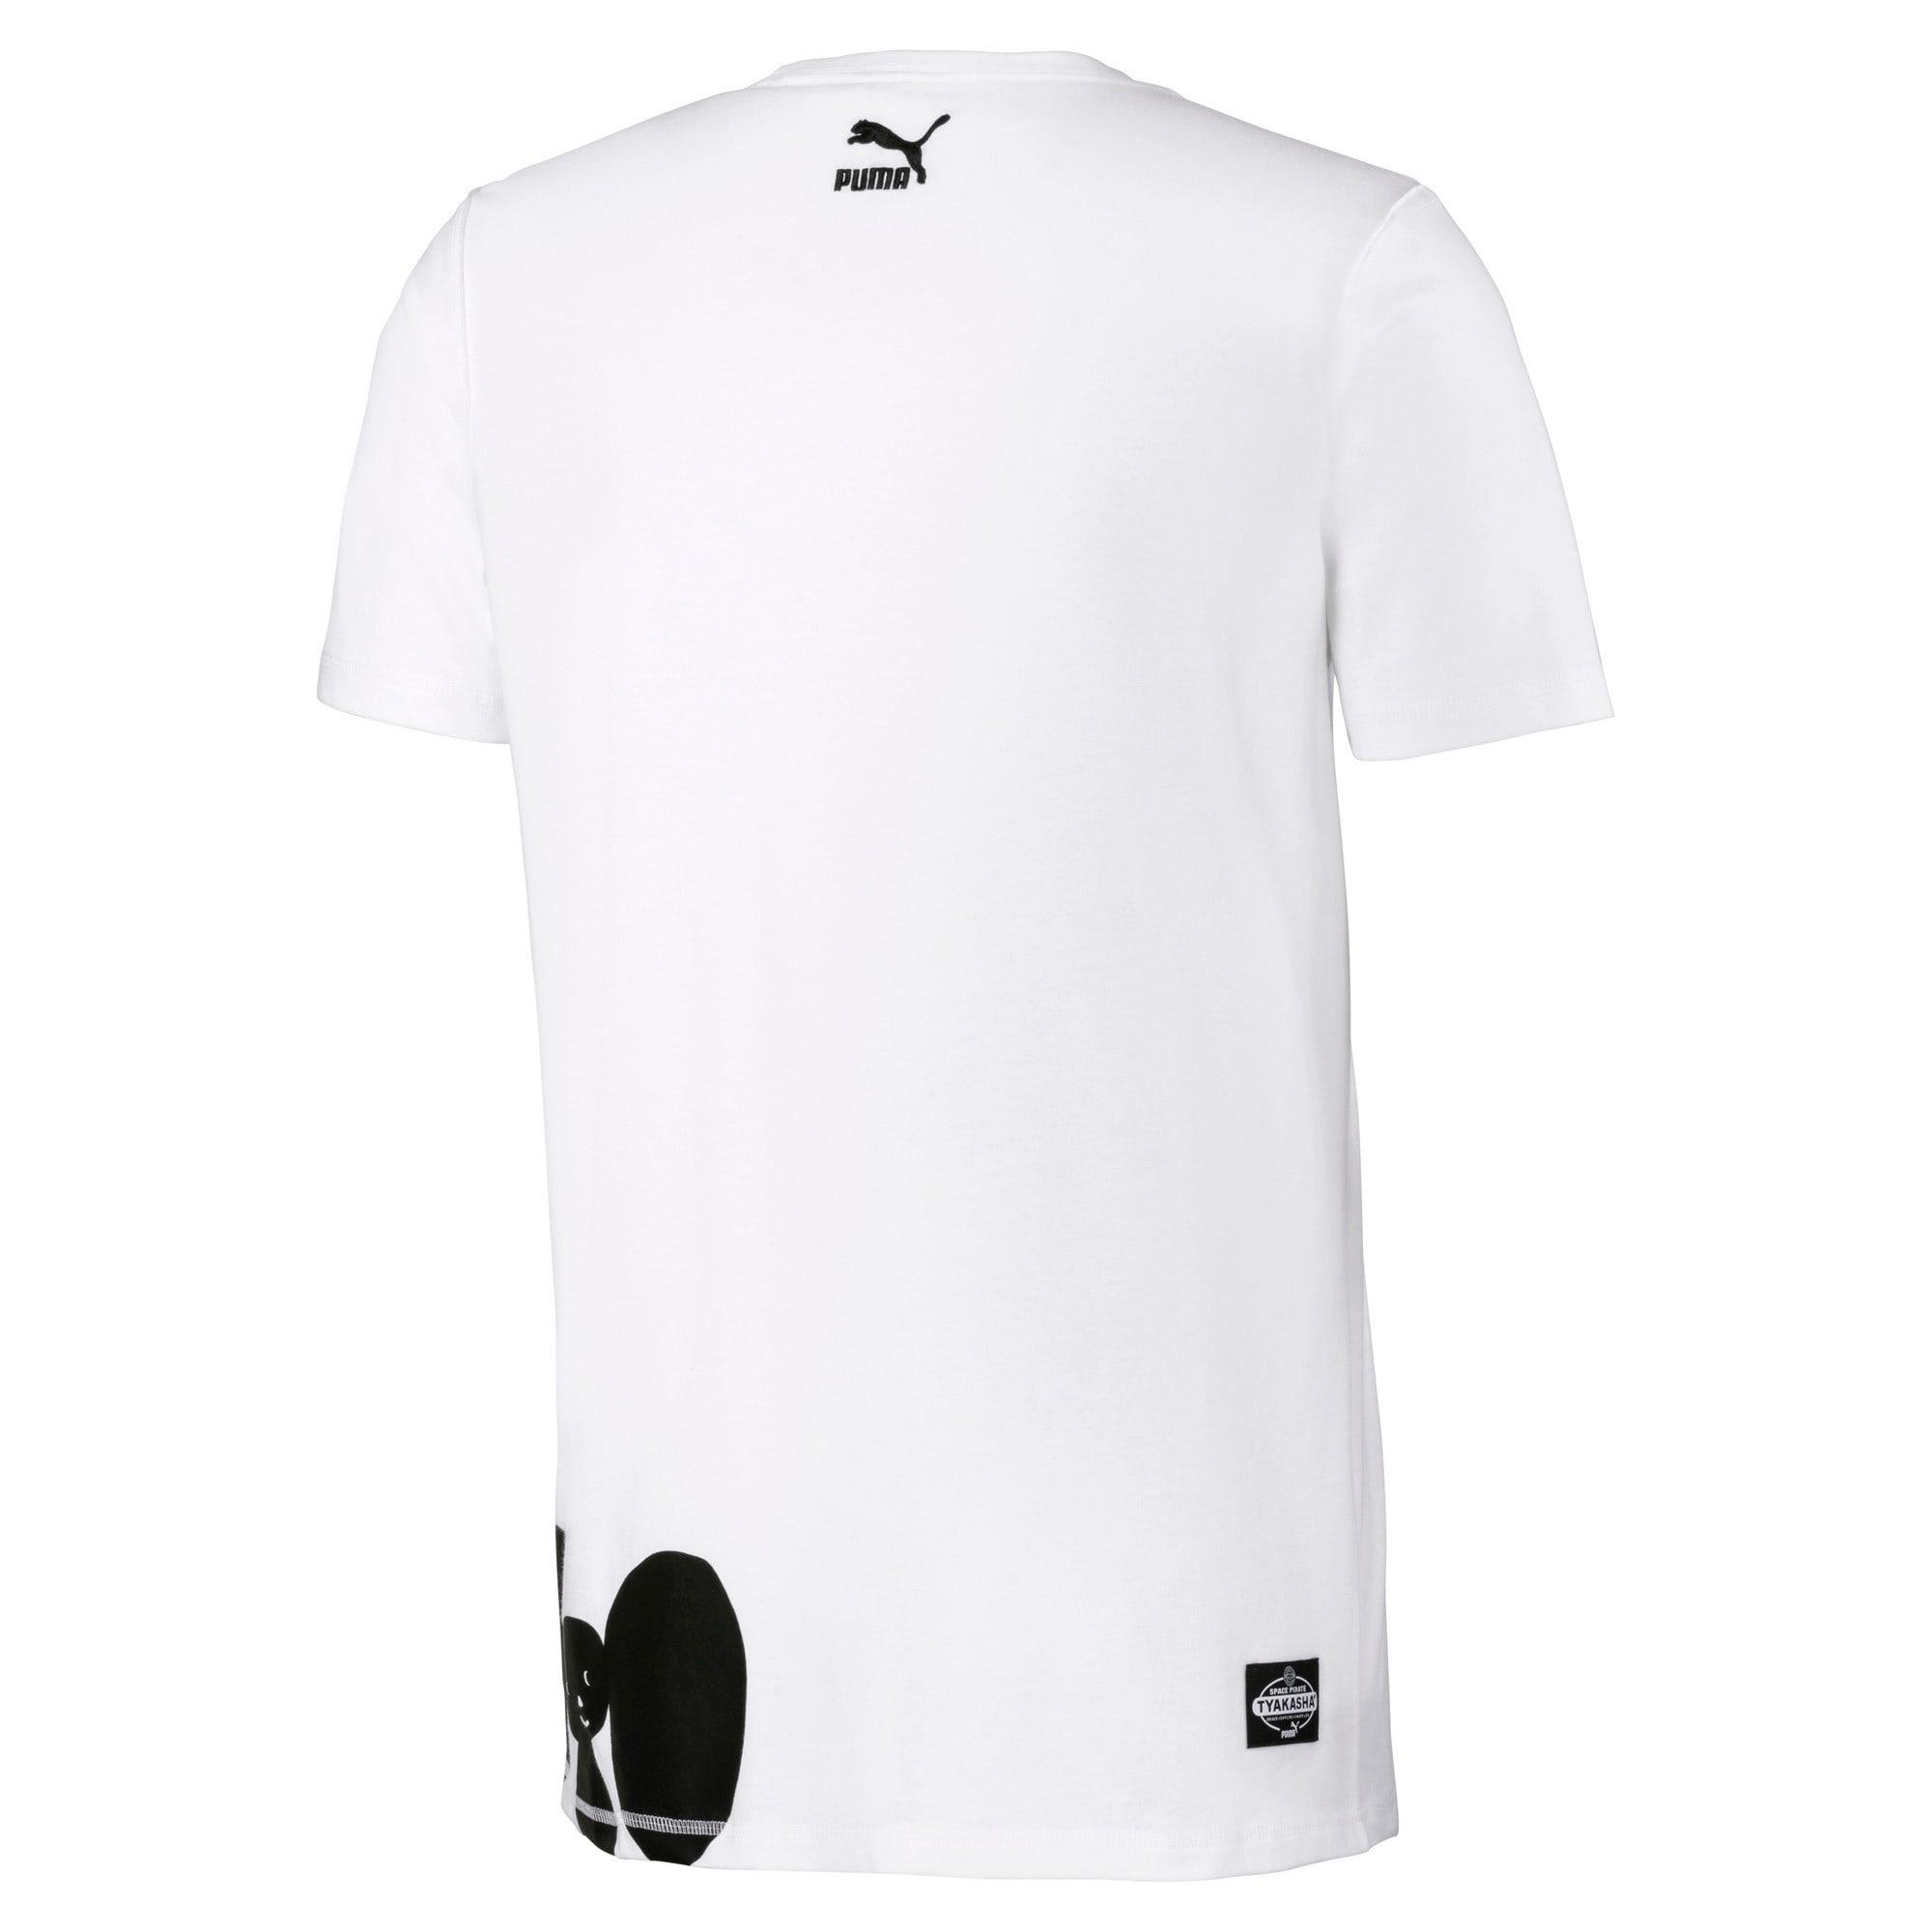 Thumbnail 3 of PUMA x TYAKASHA Tシャツ, Puma White, medium-JPN